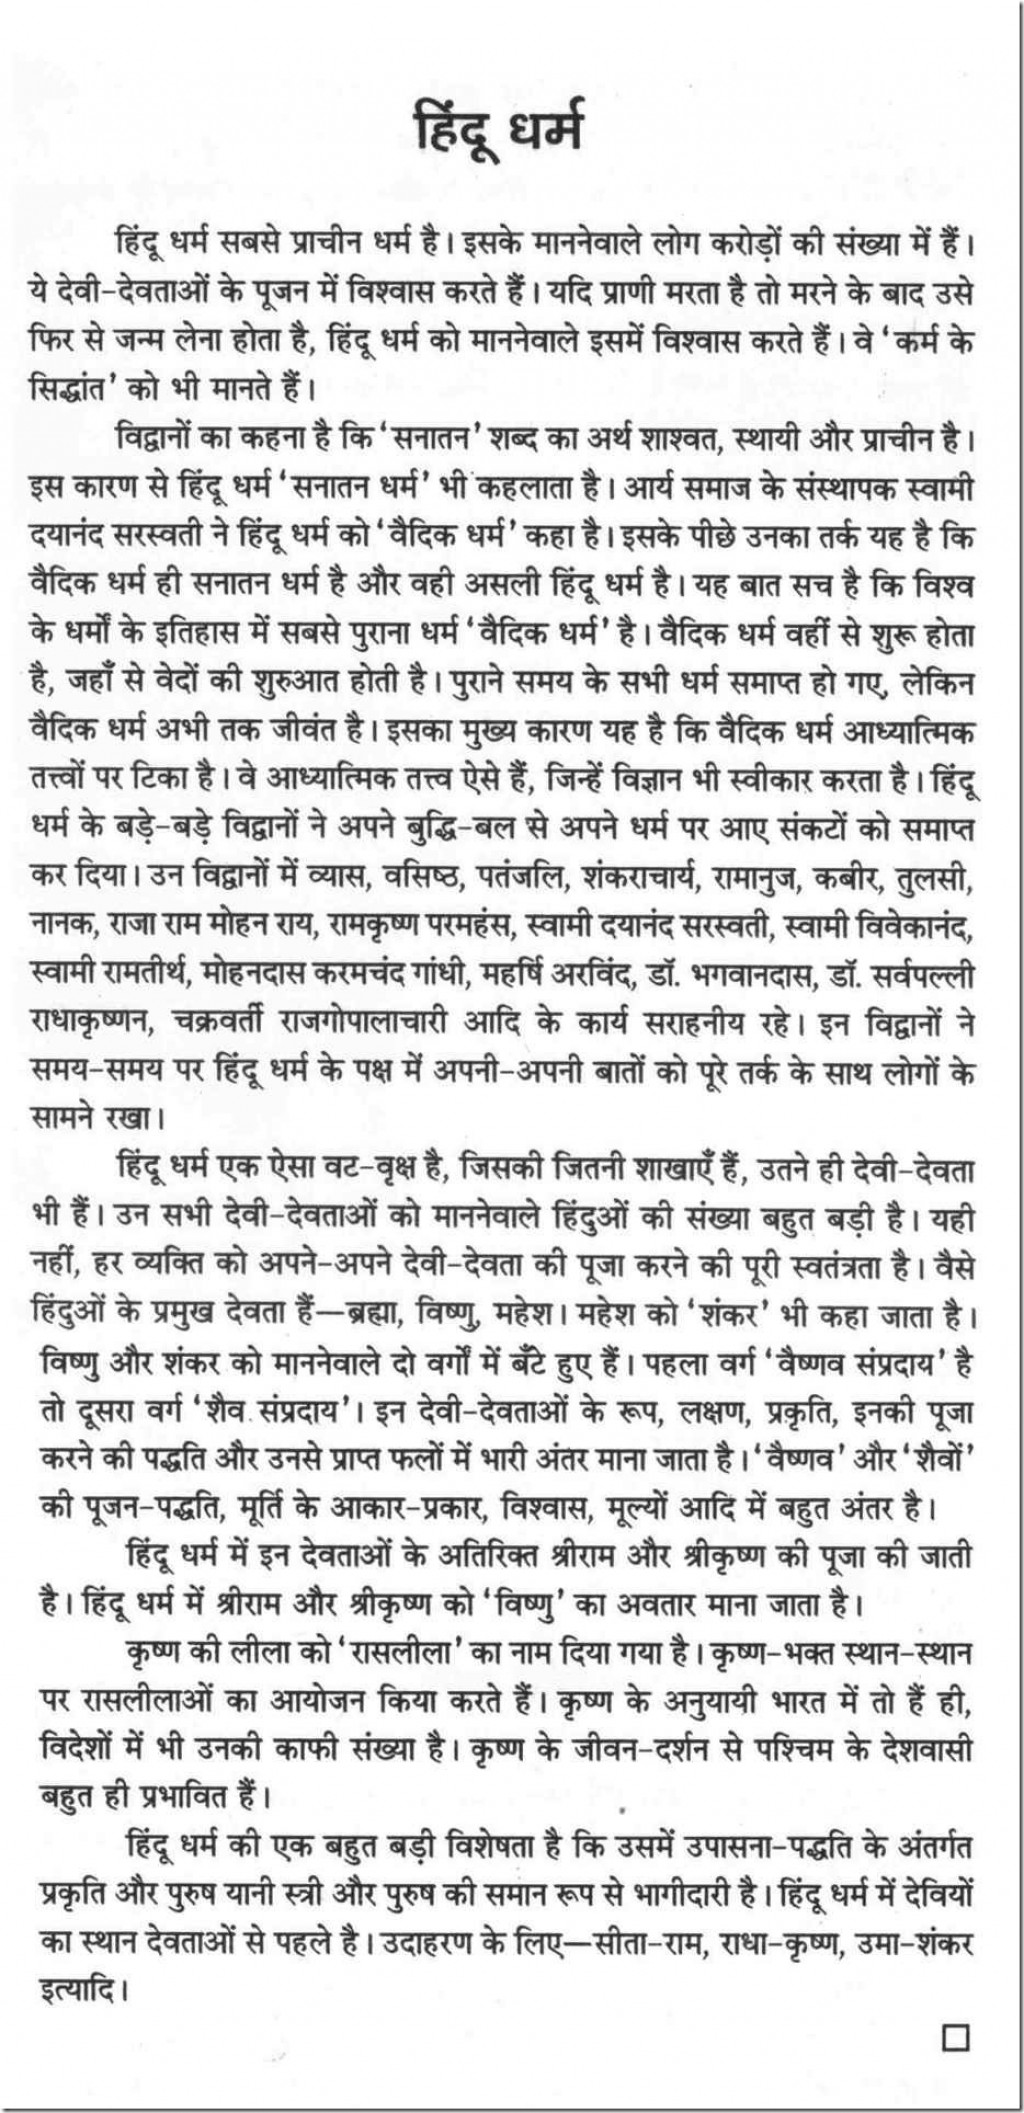 003 Hinduism Essay 10044 Thumb Surprising Questions Hindu Muslim Ekta In Hindi And Buddhism Introduction Large